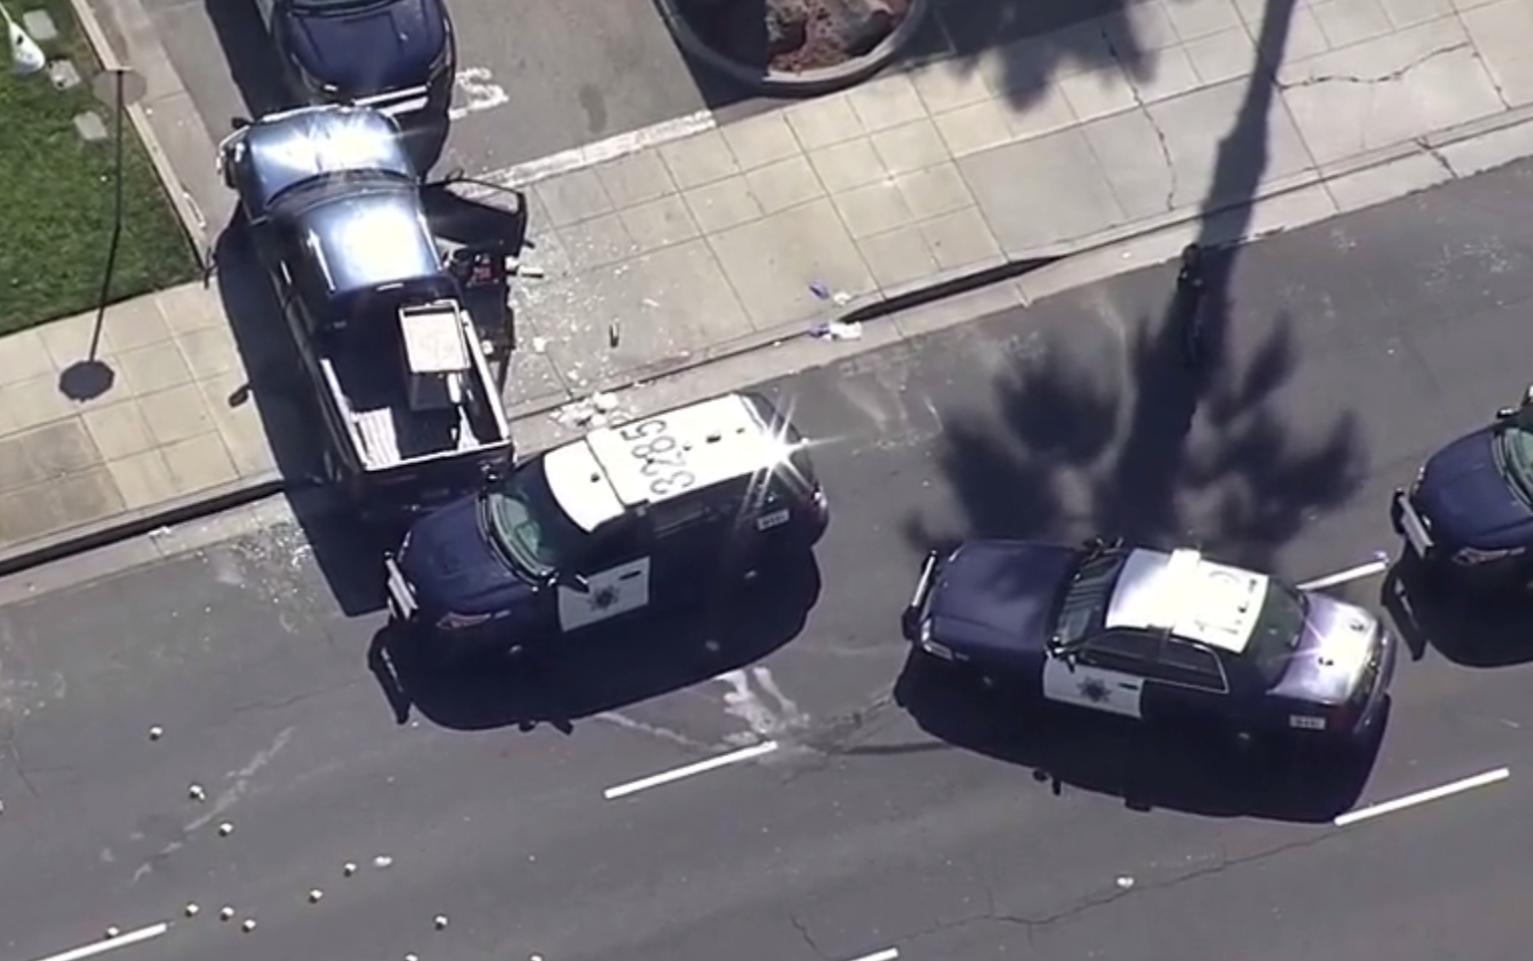 San Jose police shoot naked man after vehicle pursuit, authorities